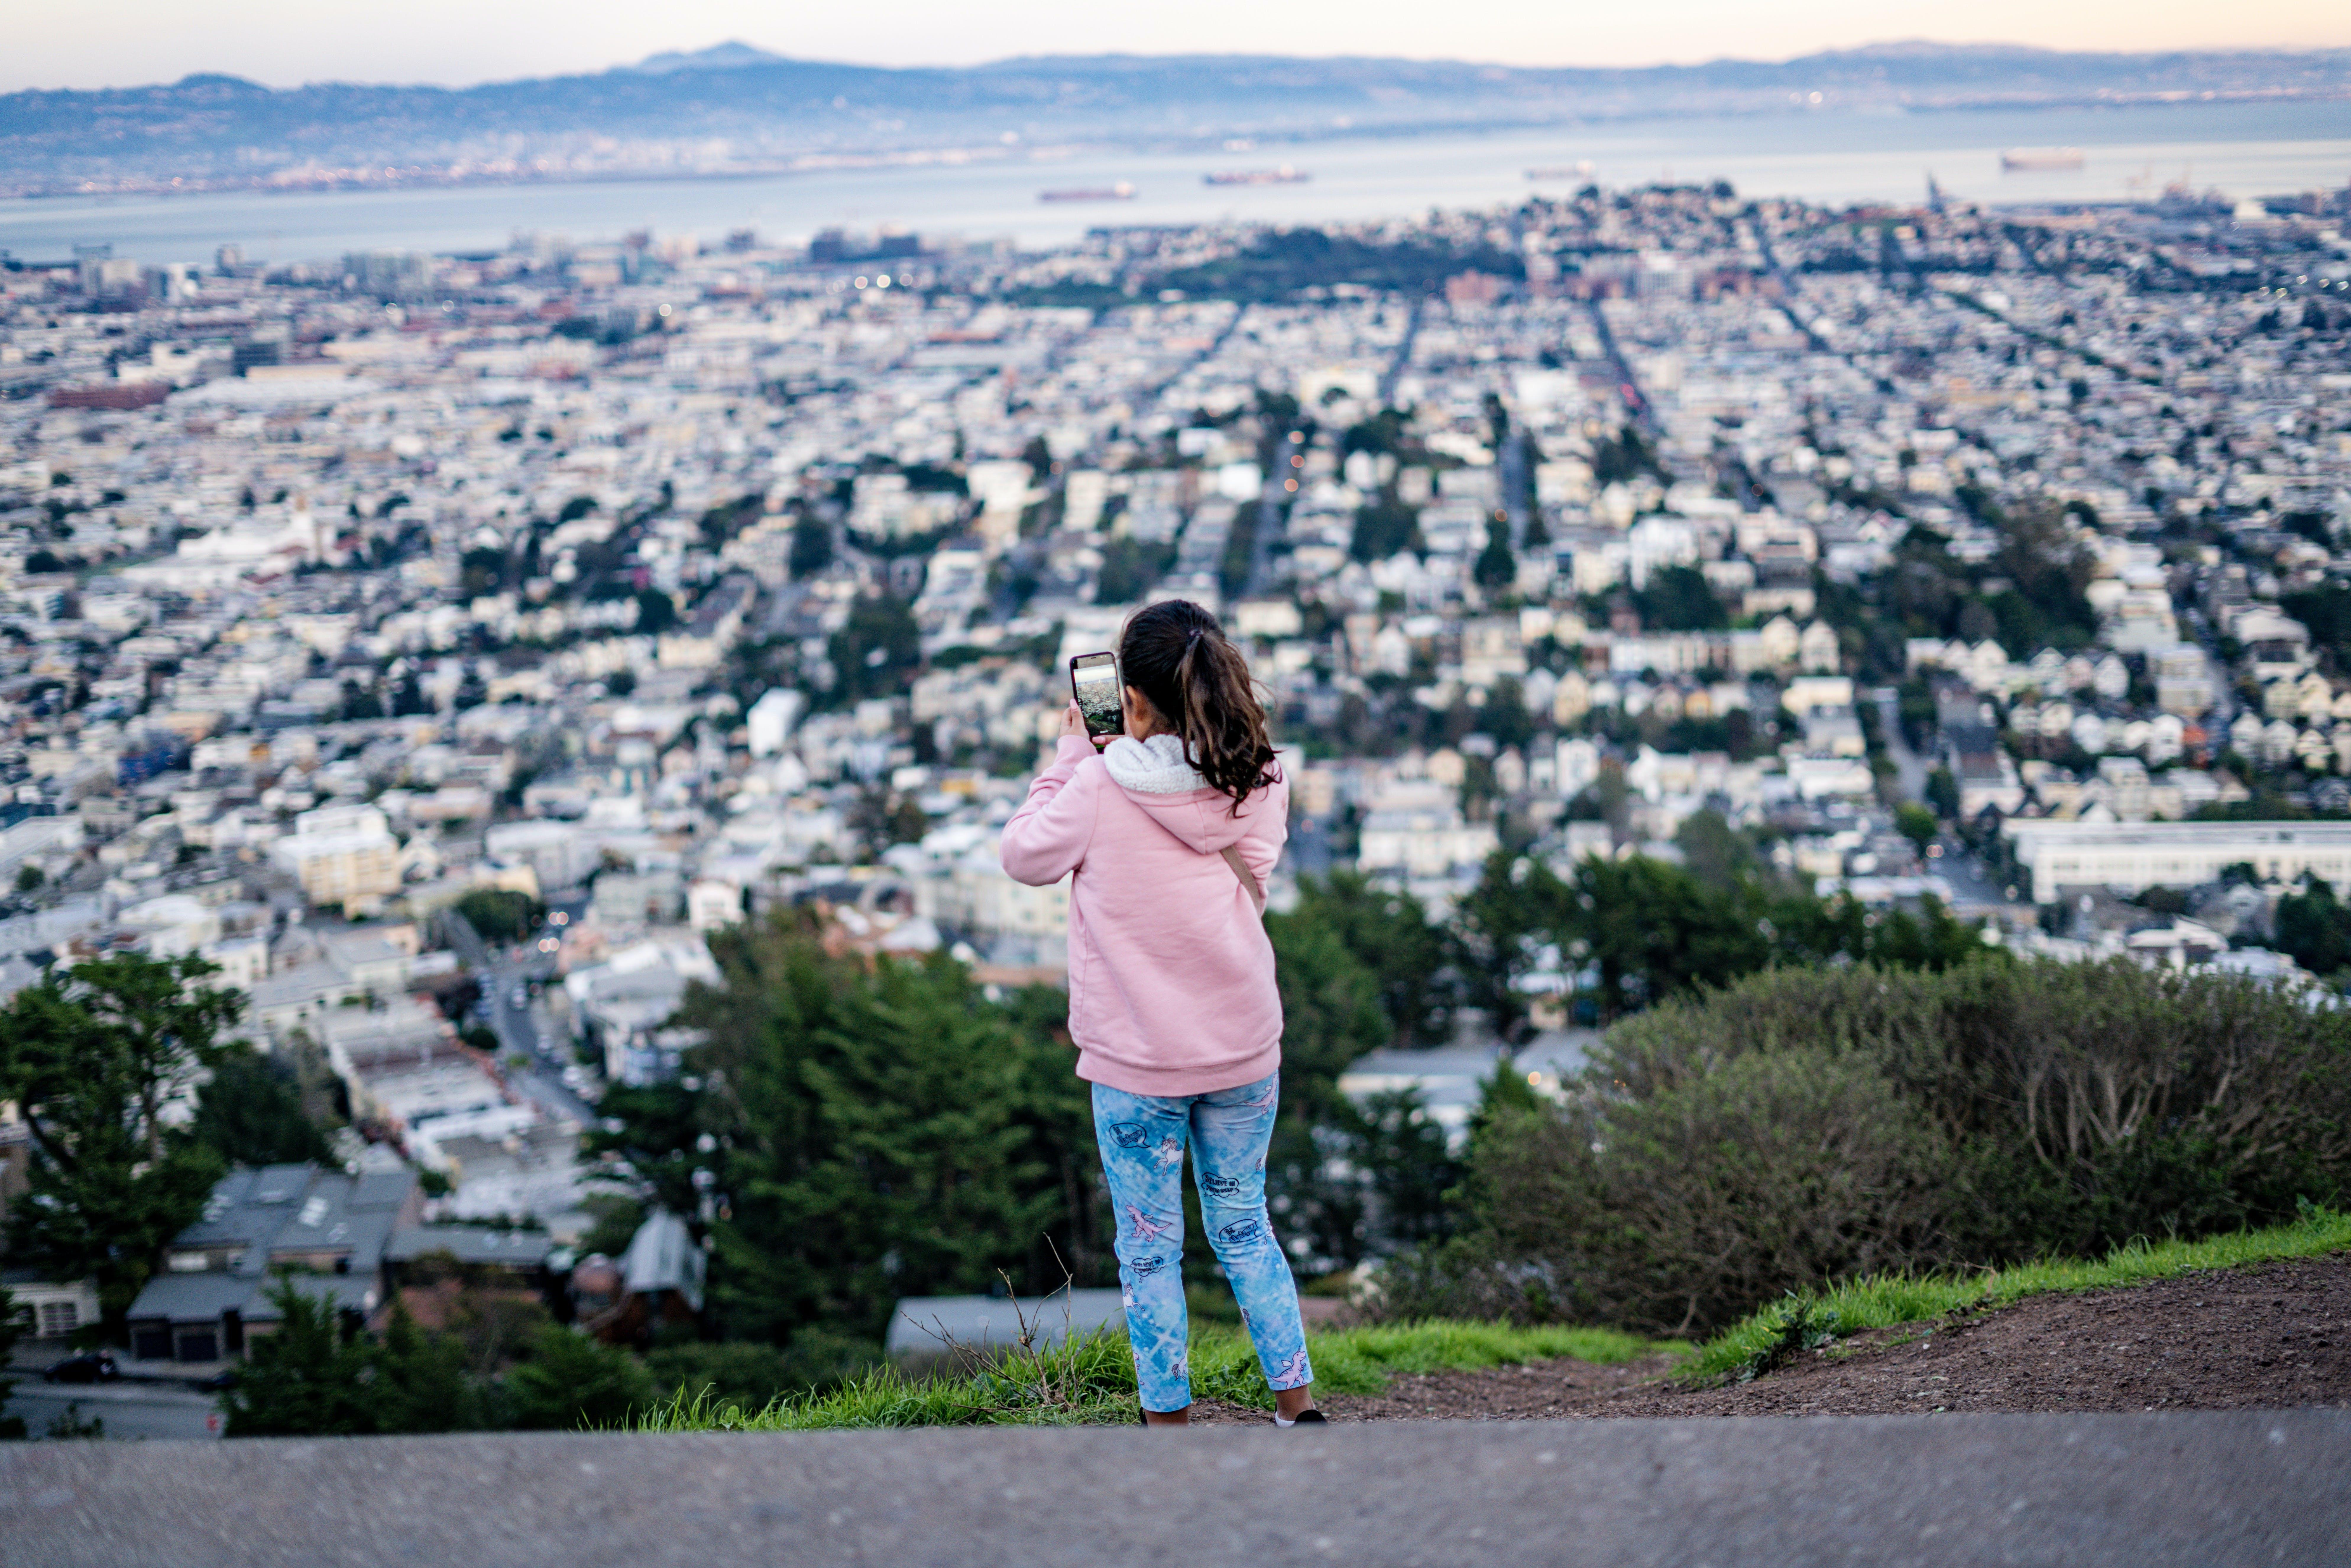 Girl Wearing Pink Hoodie Taking Photo of City